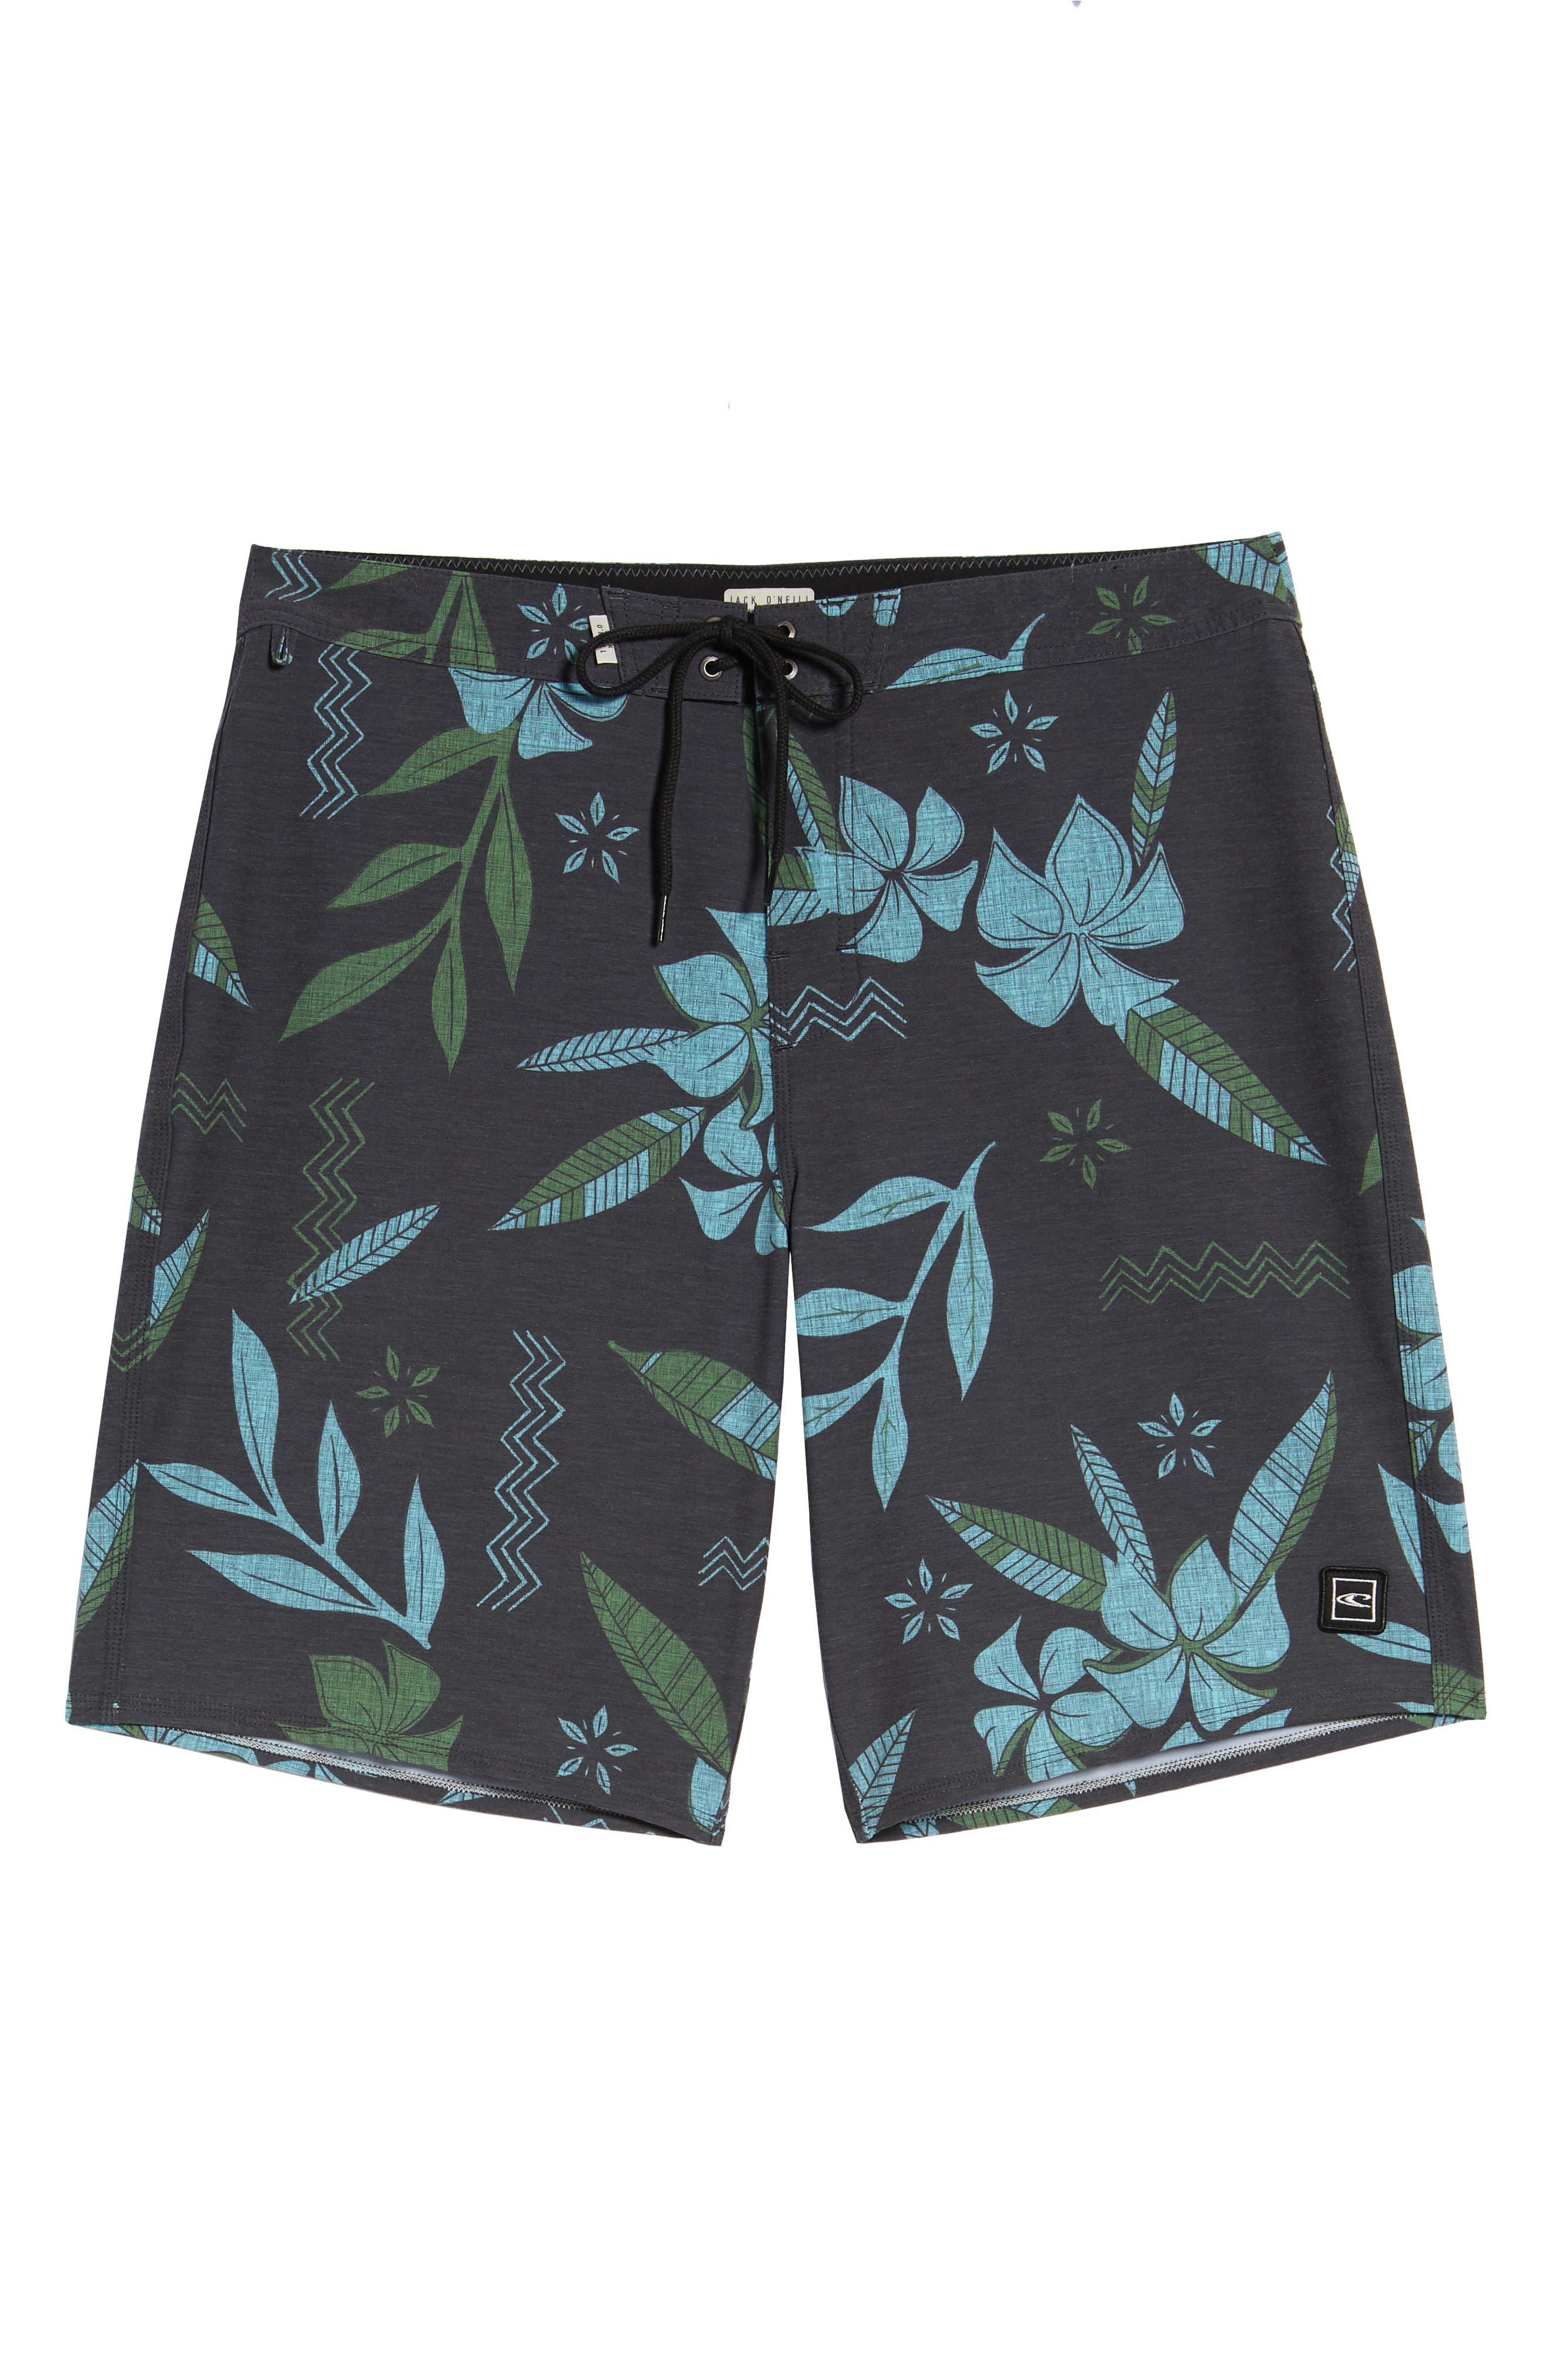 JACK O'NEILL,                             Maui Board Shorts,                             Alternate thumbnail 6, color,                             001